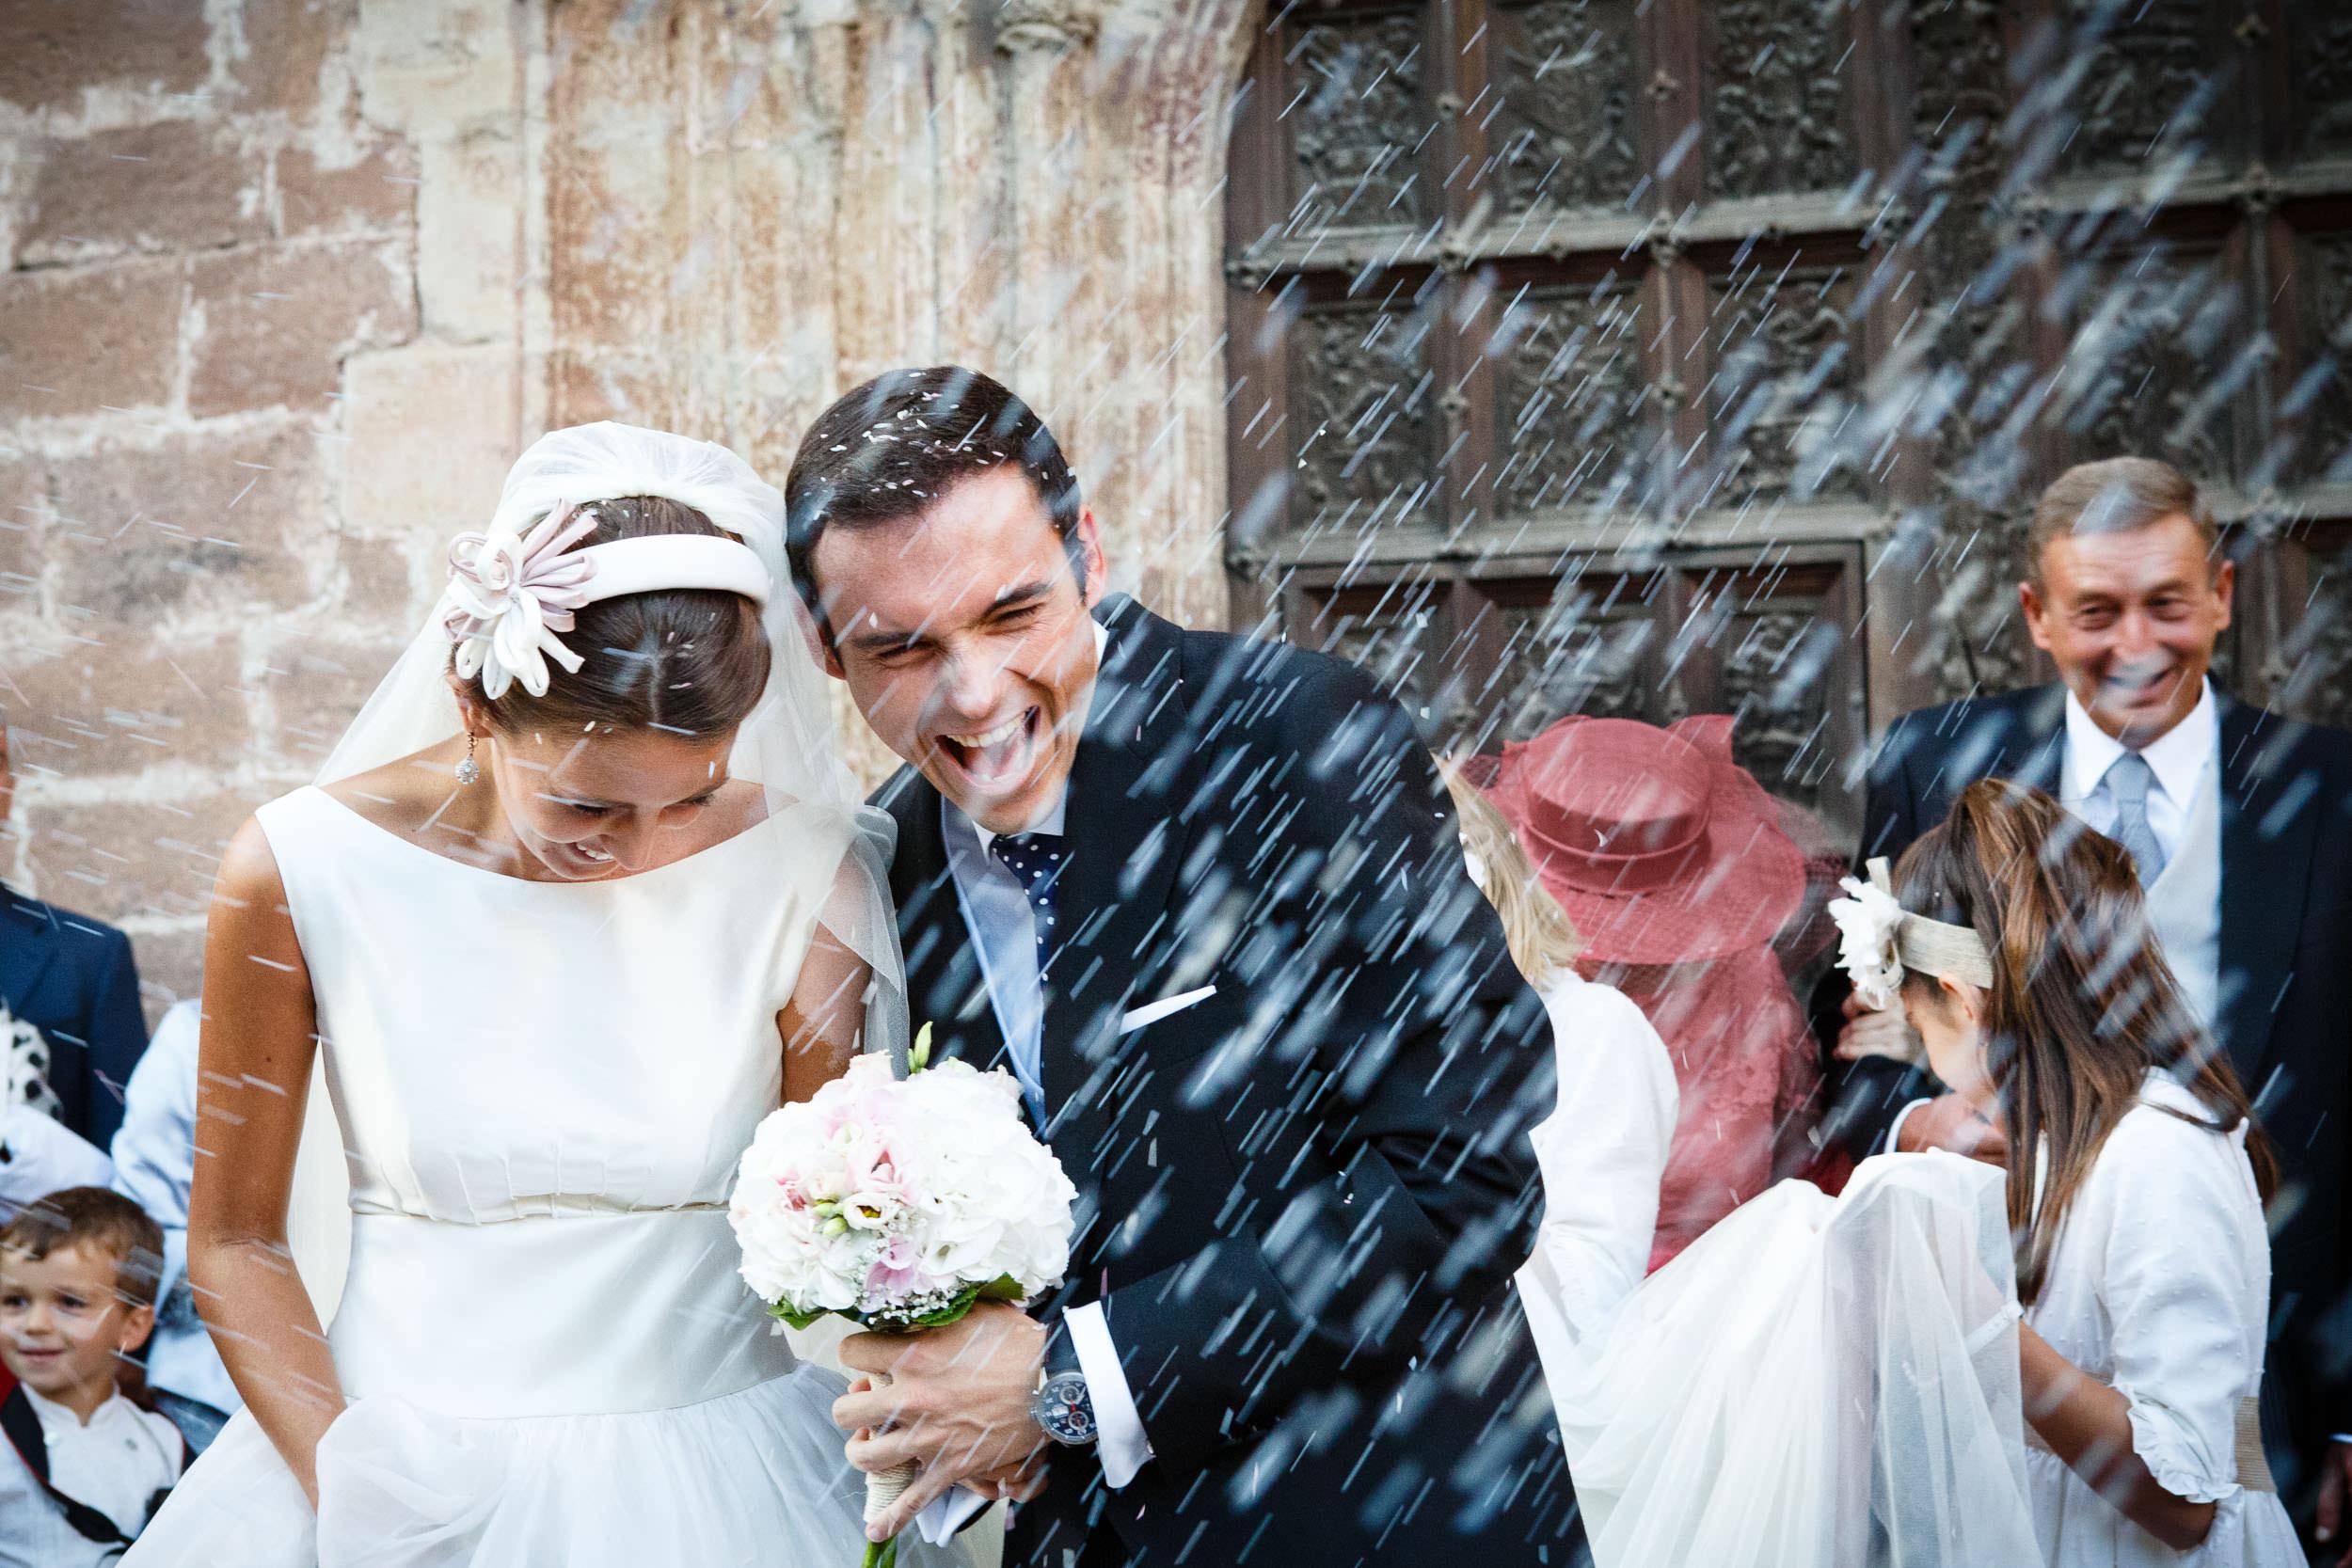 Wedding Photographer La Rioja Basque Country Spain - James Sturcke - sturcke.org_028.jpg